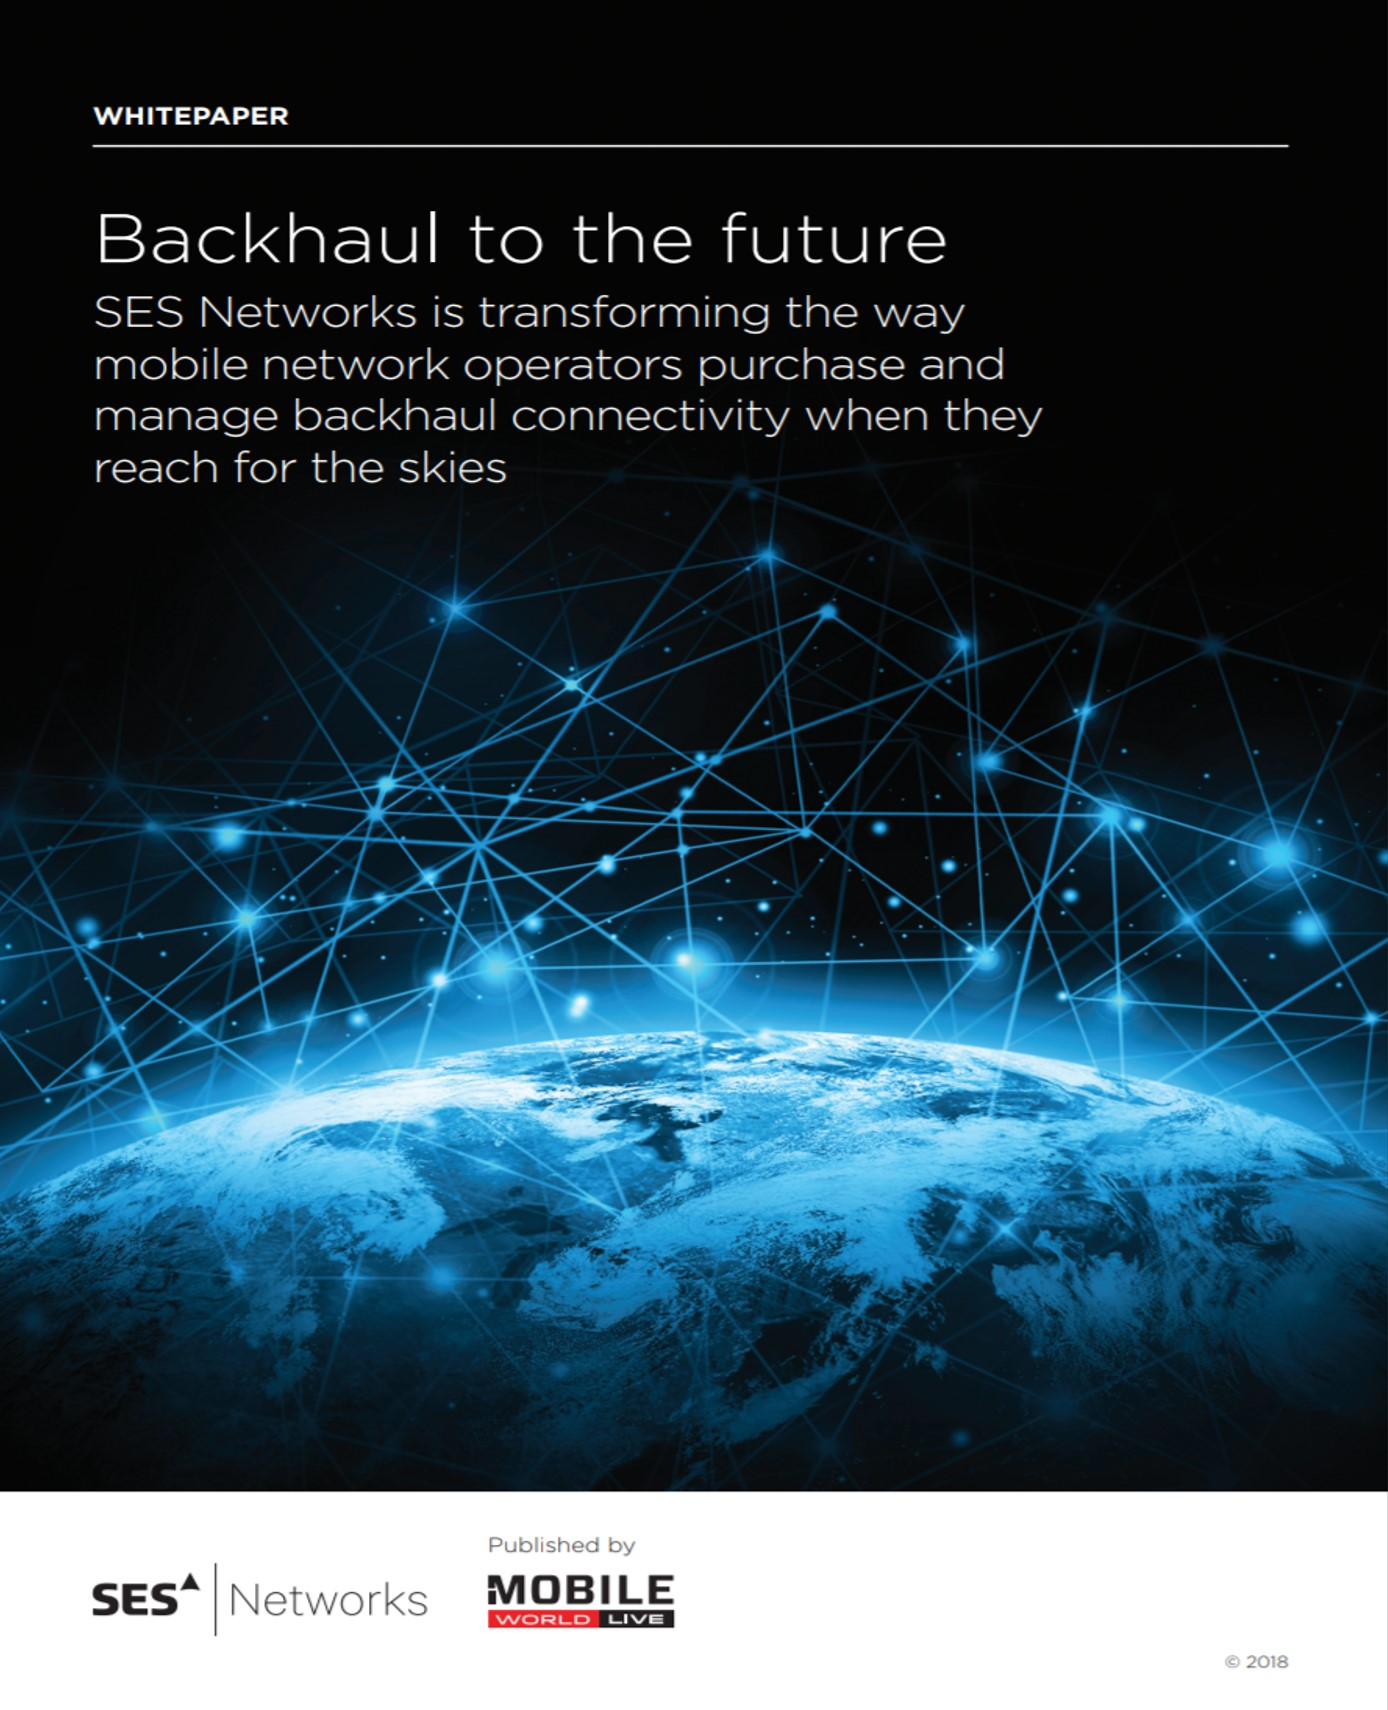 Backhaul to the future